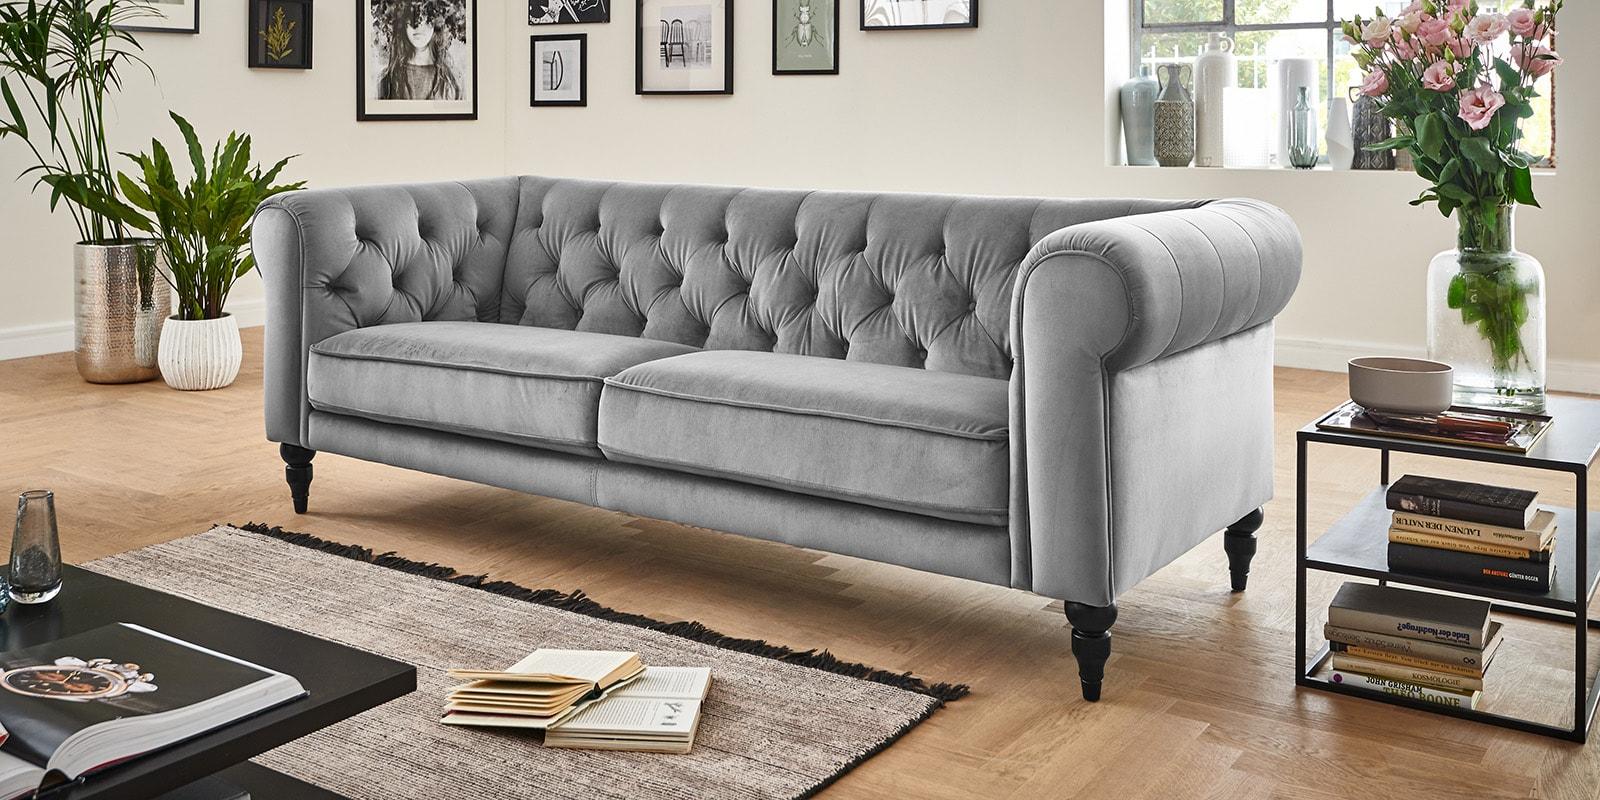 Full Size of Couch 3 Sitzer Grau Ikea Sofa Leder Louisiana (3 Sitzer Mit Polster Grau) 3 Sitzer Nino Schwarz/grau Schlaffunktion Samt 2 Und Rattan Retro Kingsley Sofa Sofa 3 Sitzer Grau